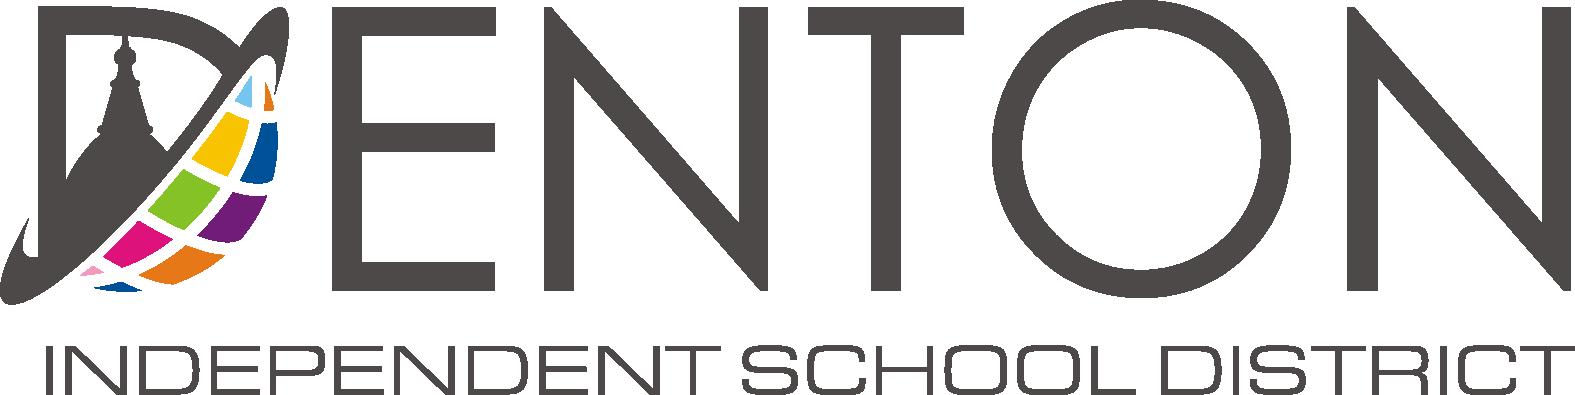 educational improvement council    denton isd logo